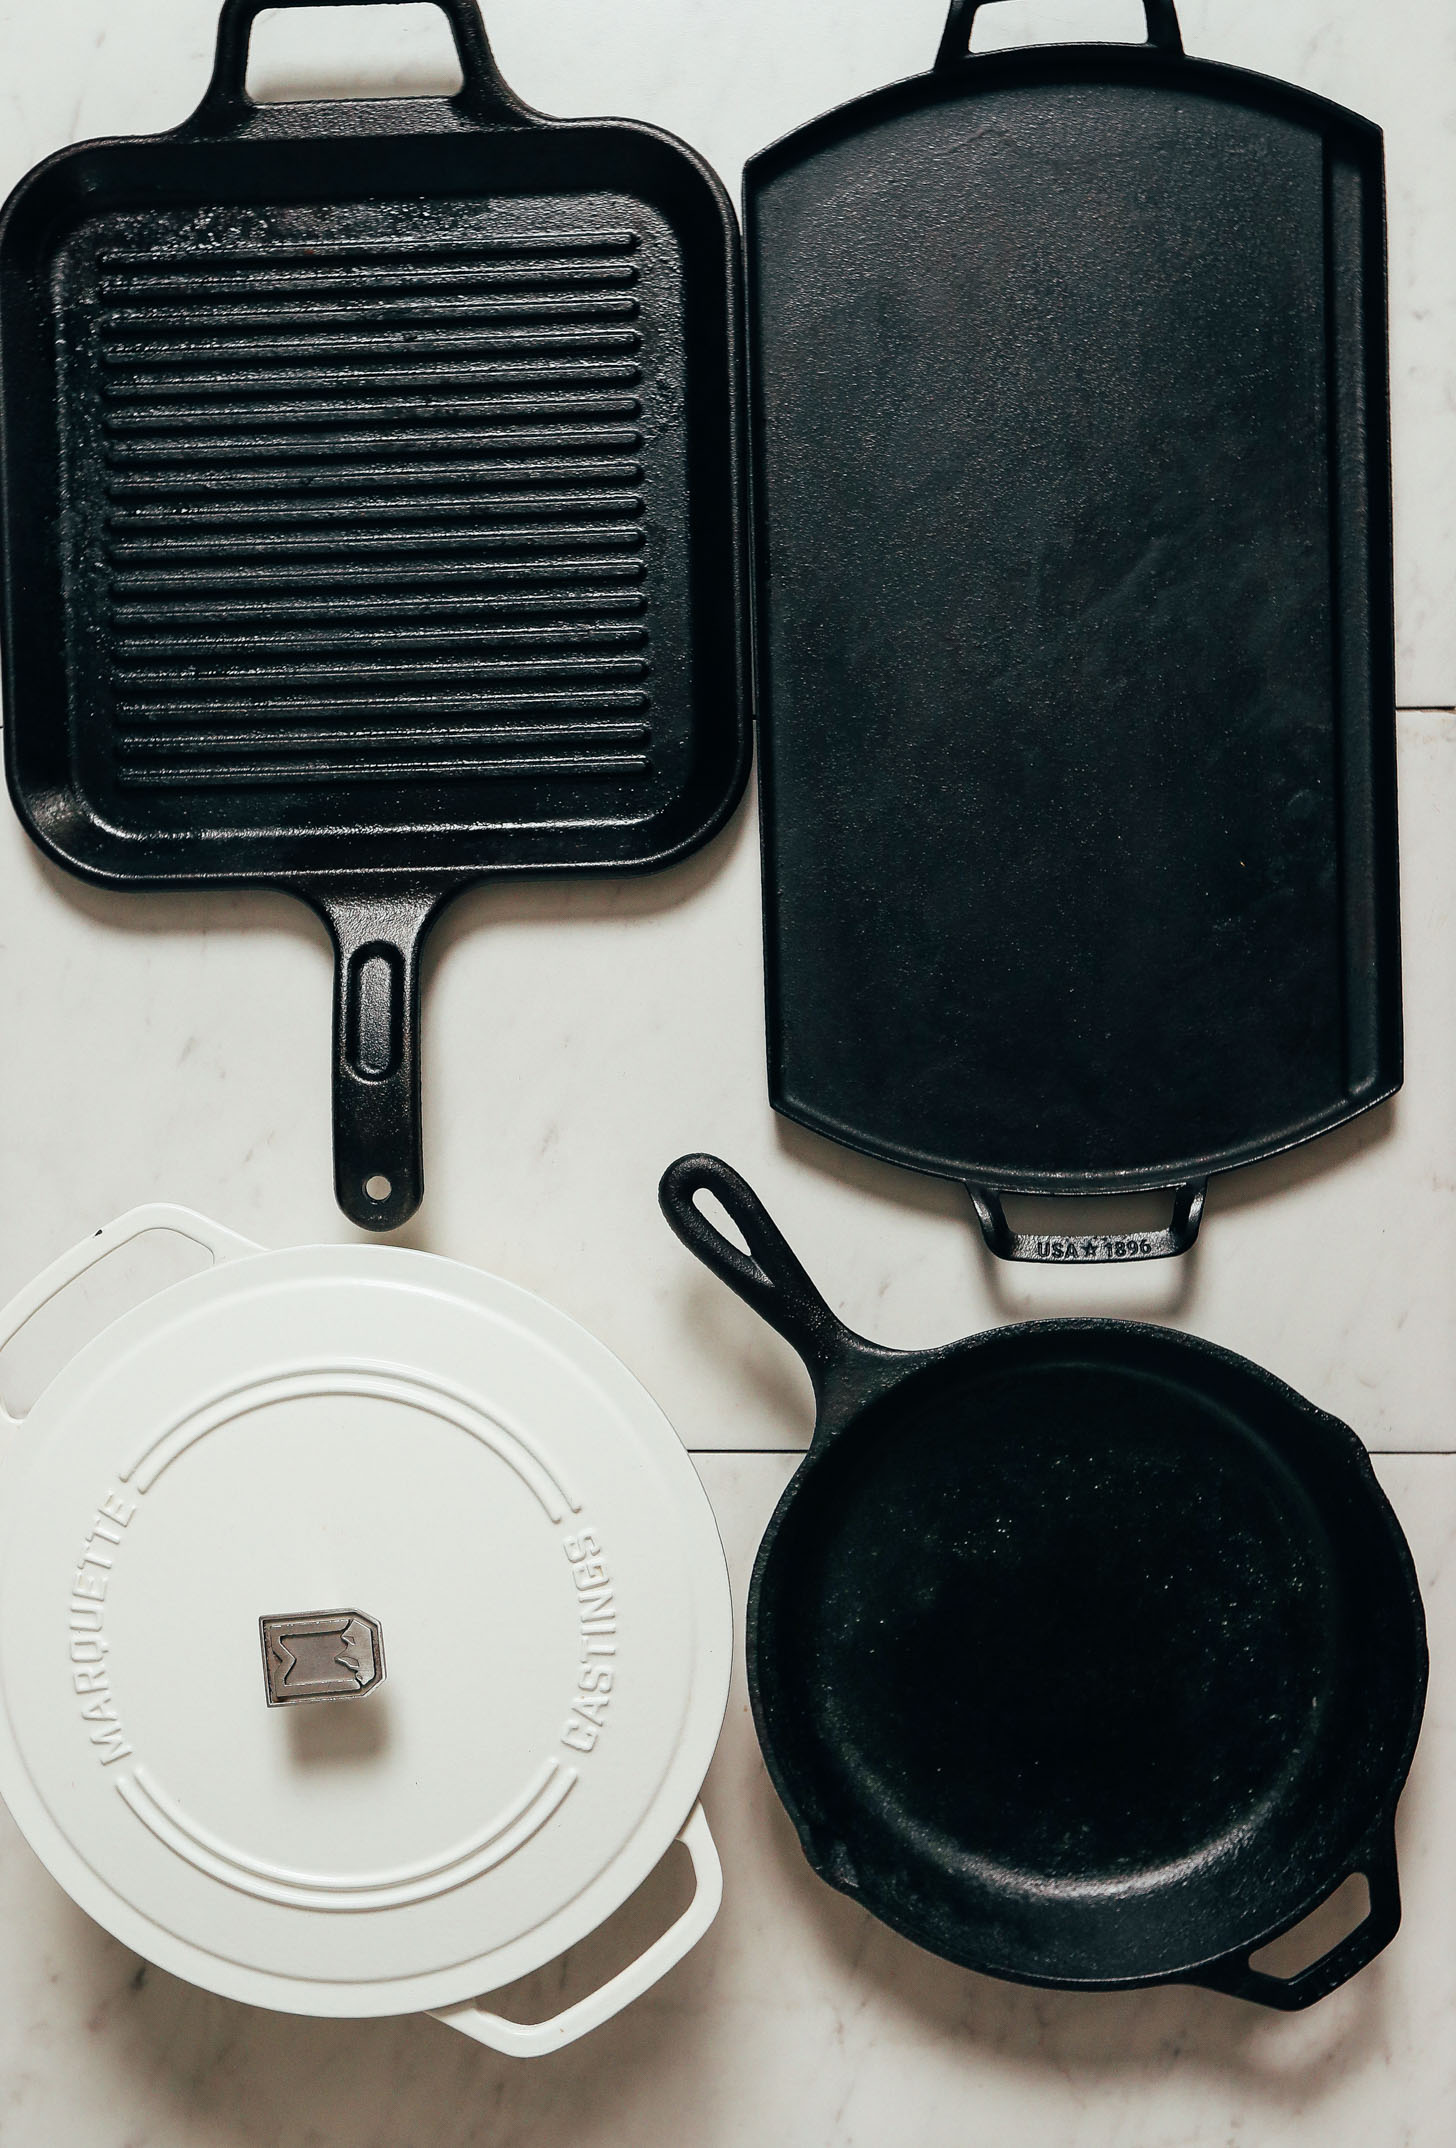 Assortment of cast iron pans